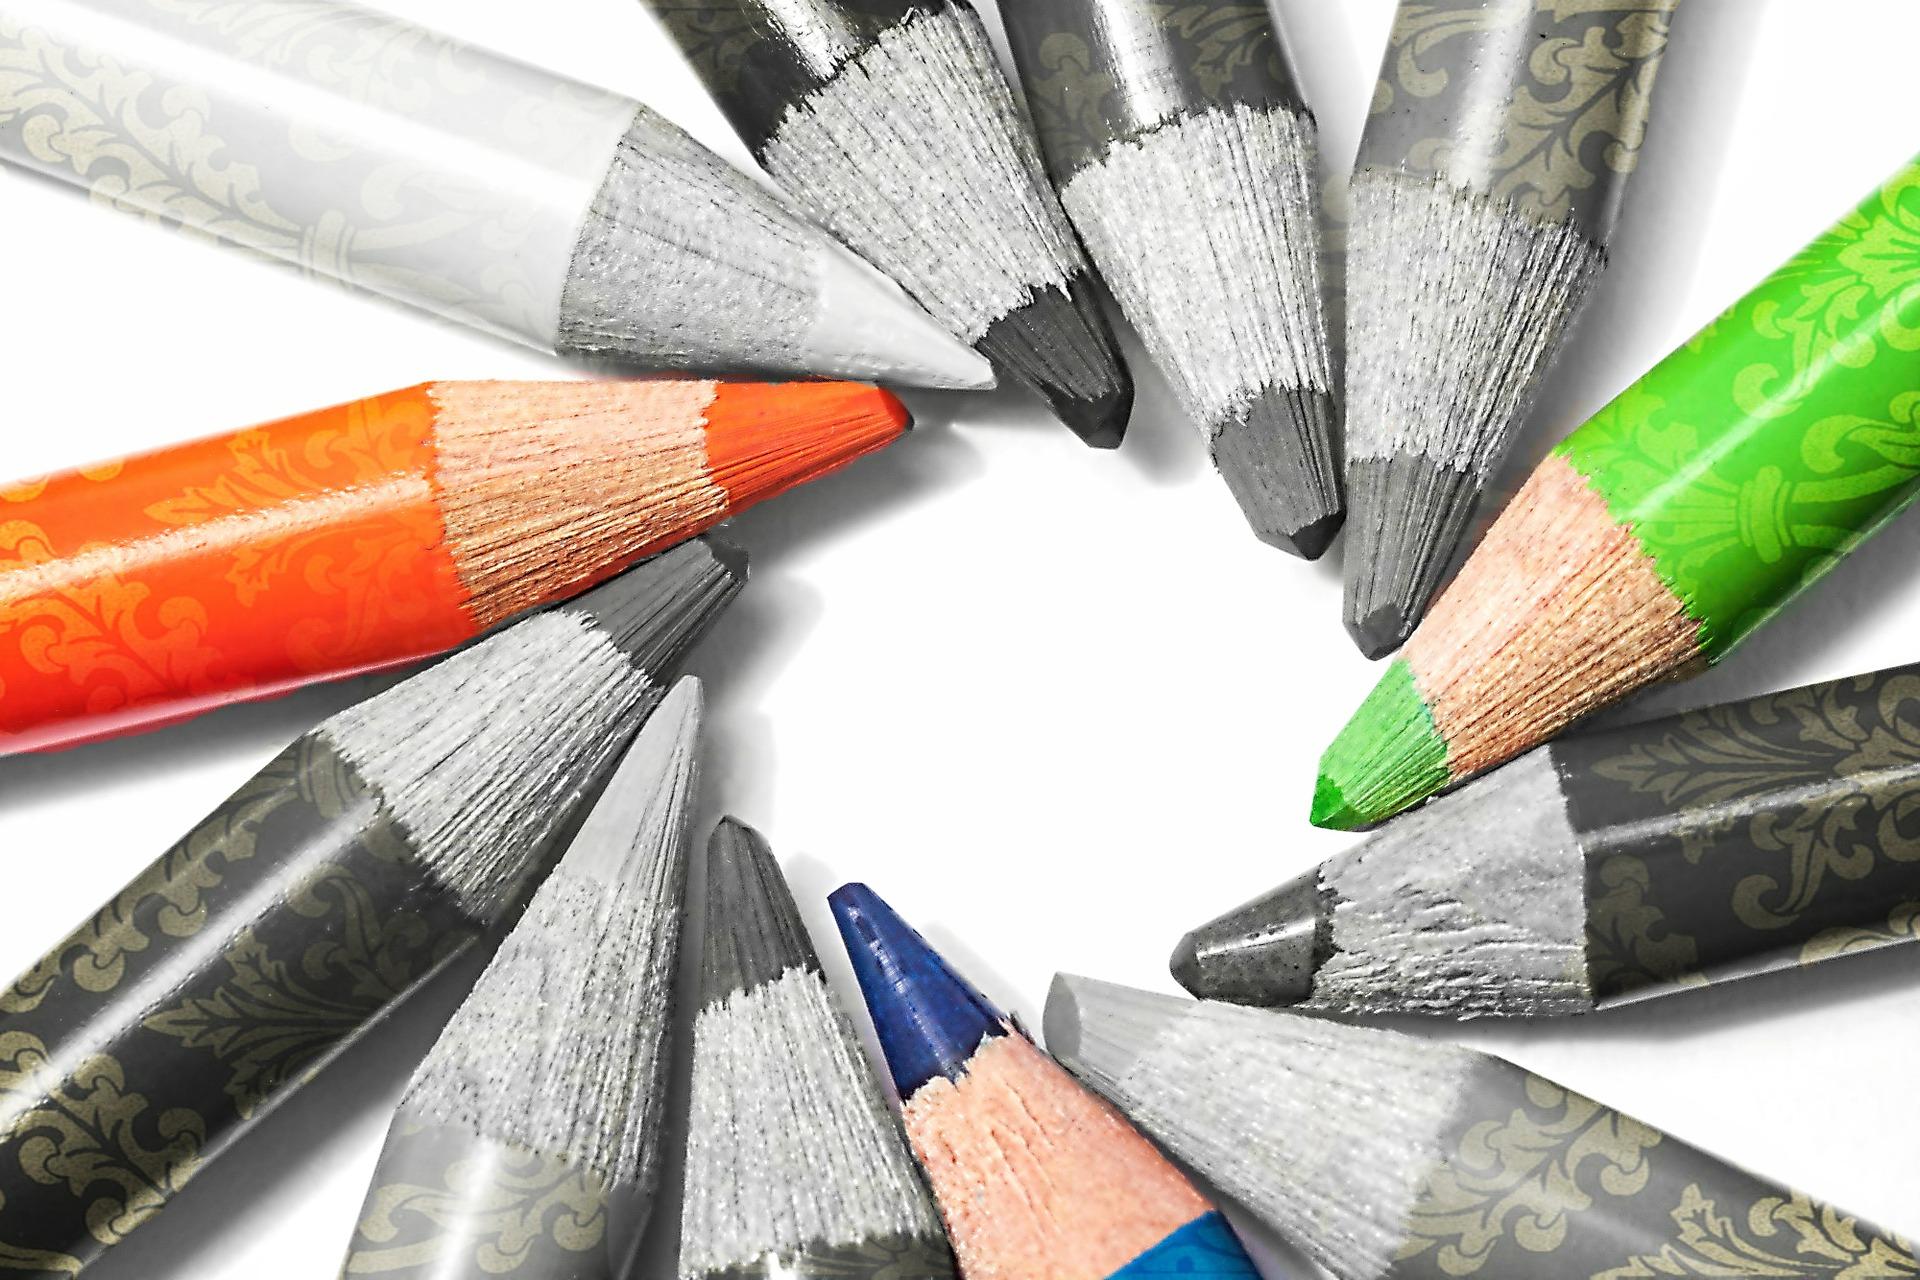 pens-609210_1920